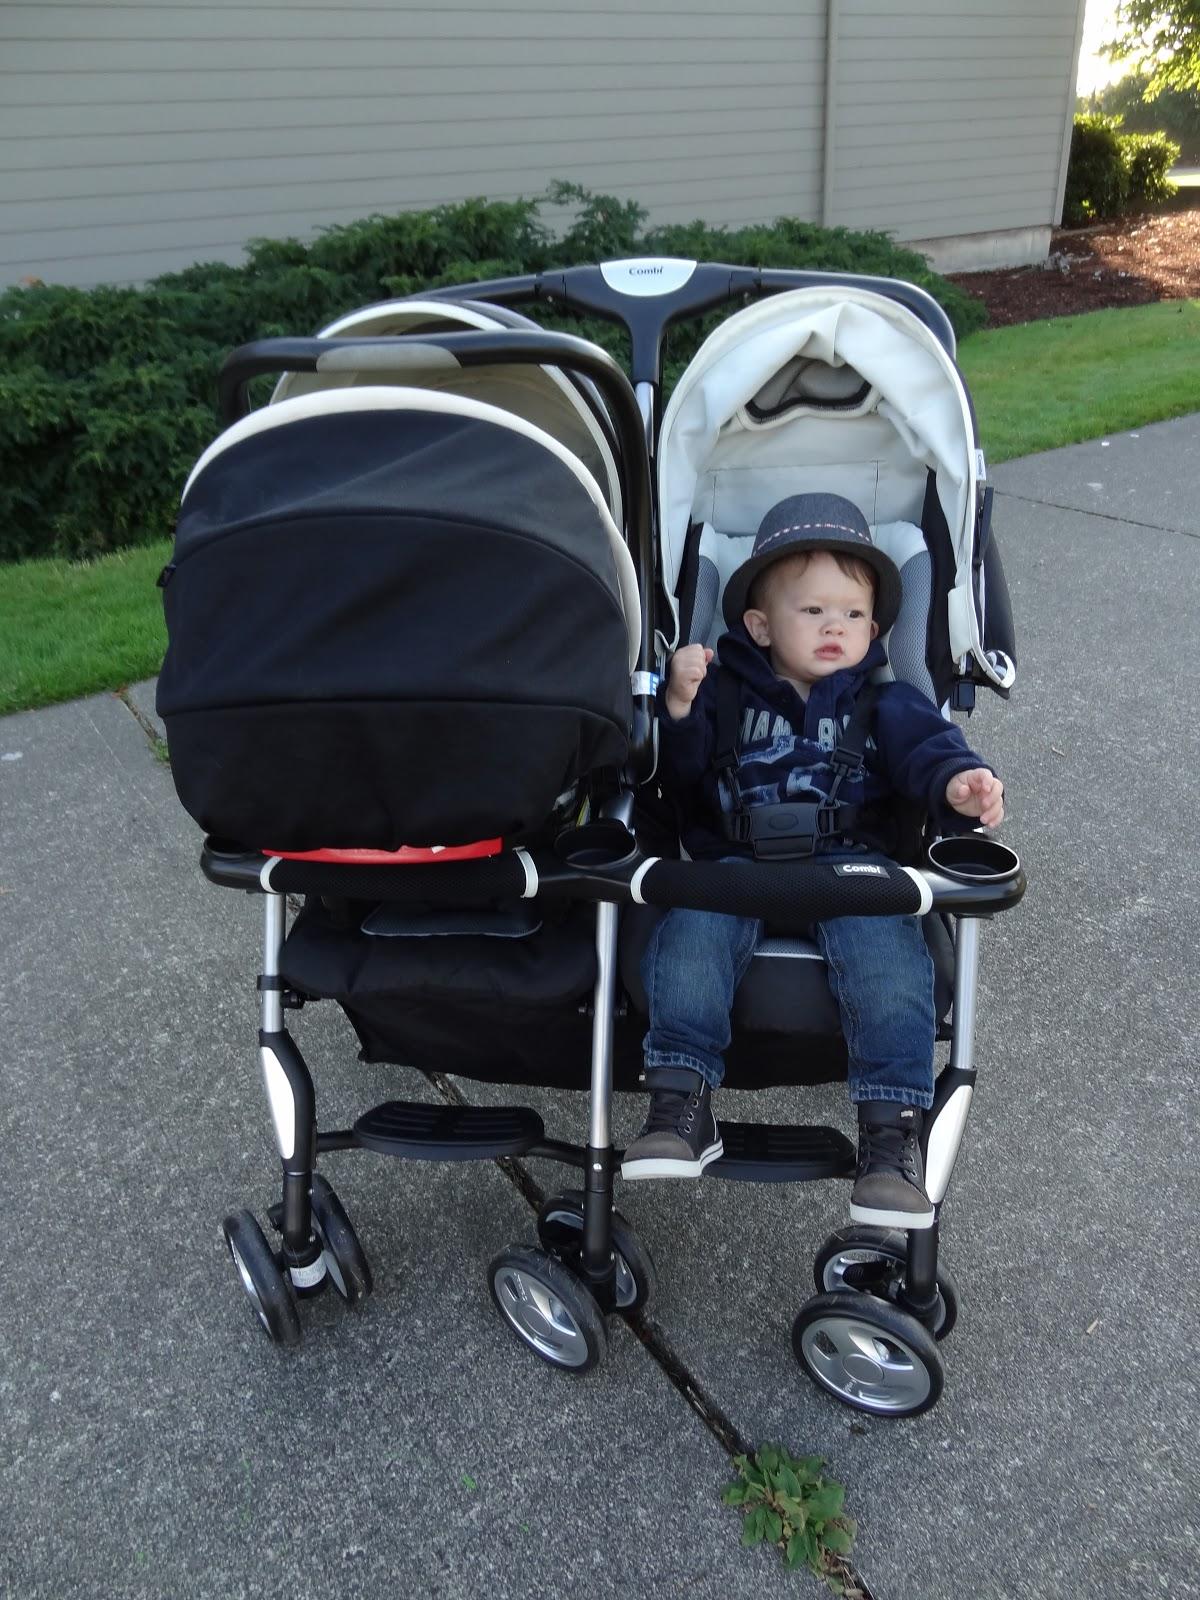 bargain: combi double stroller